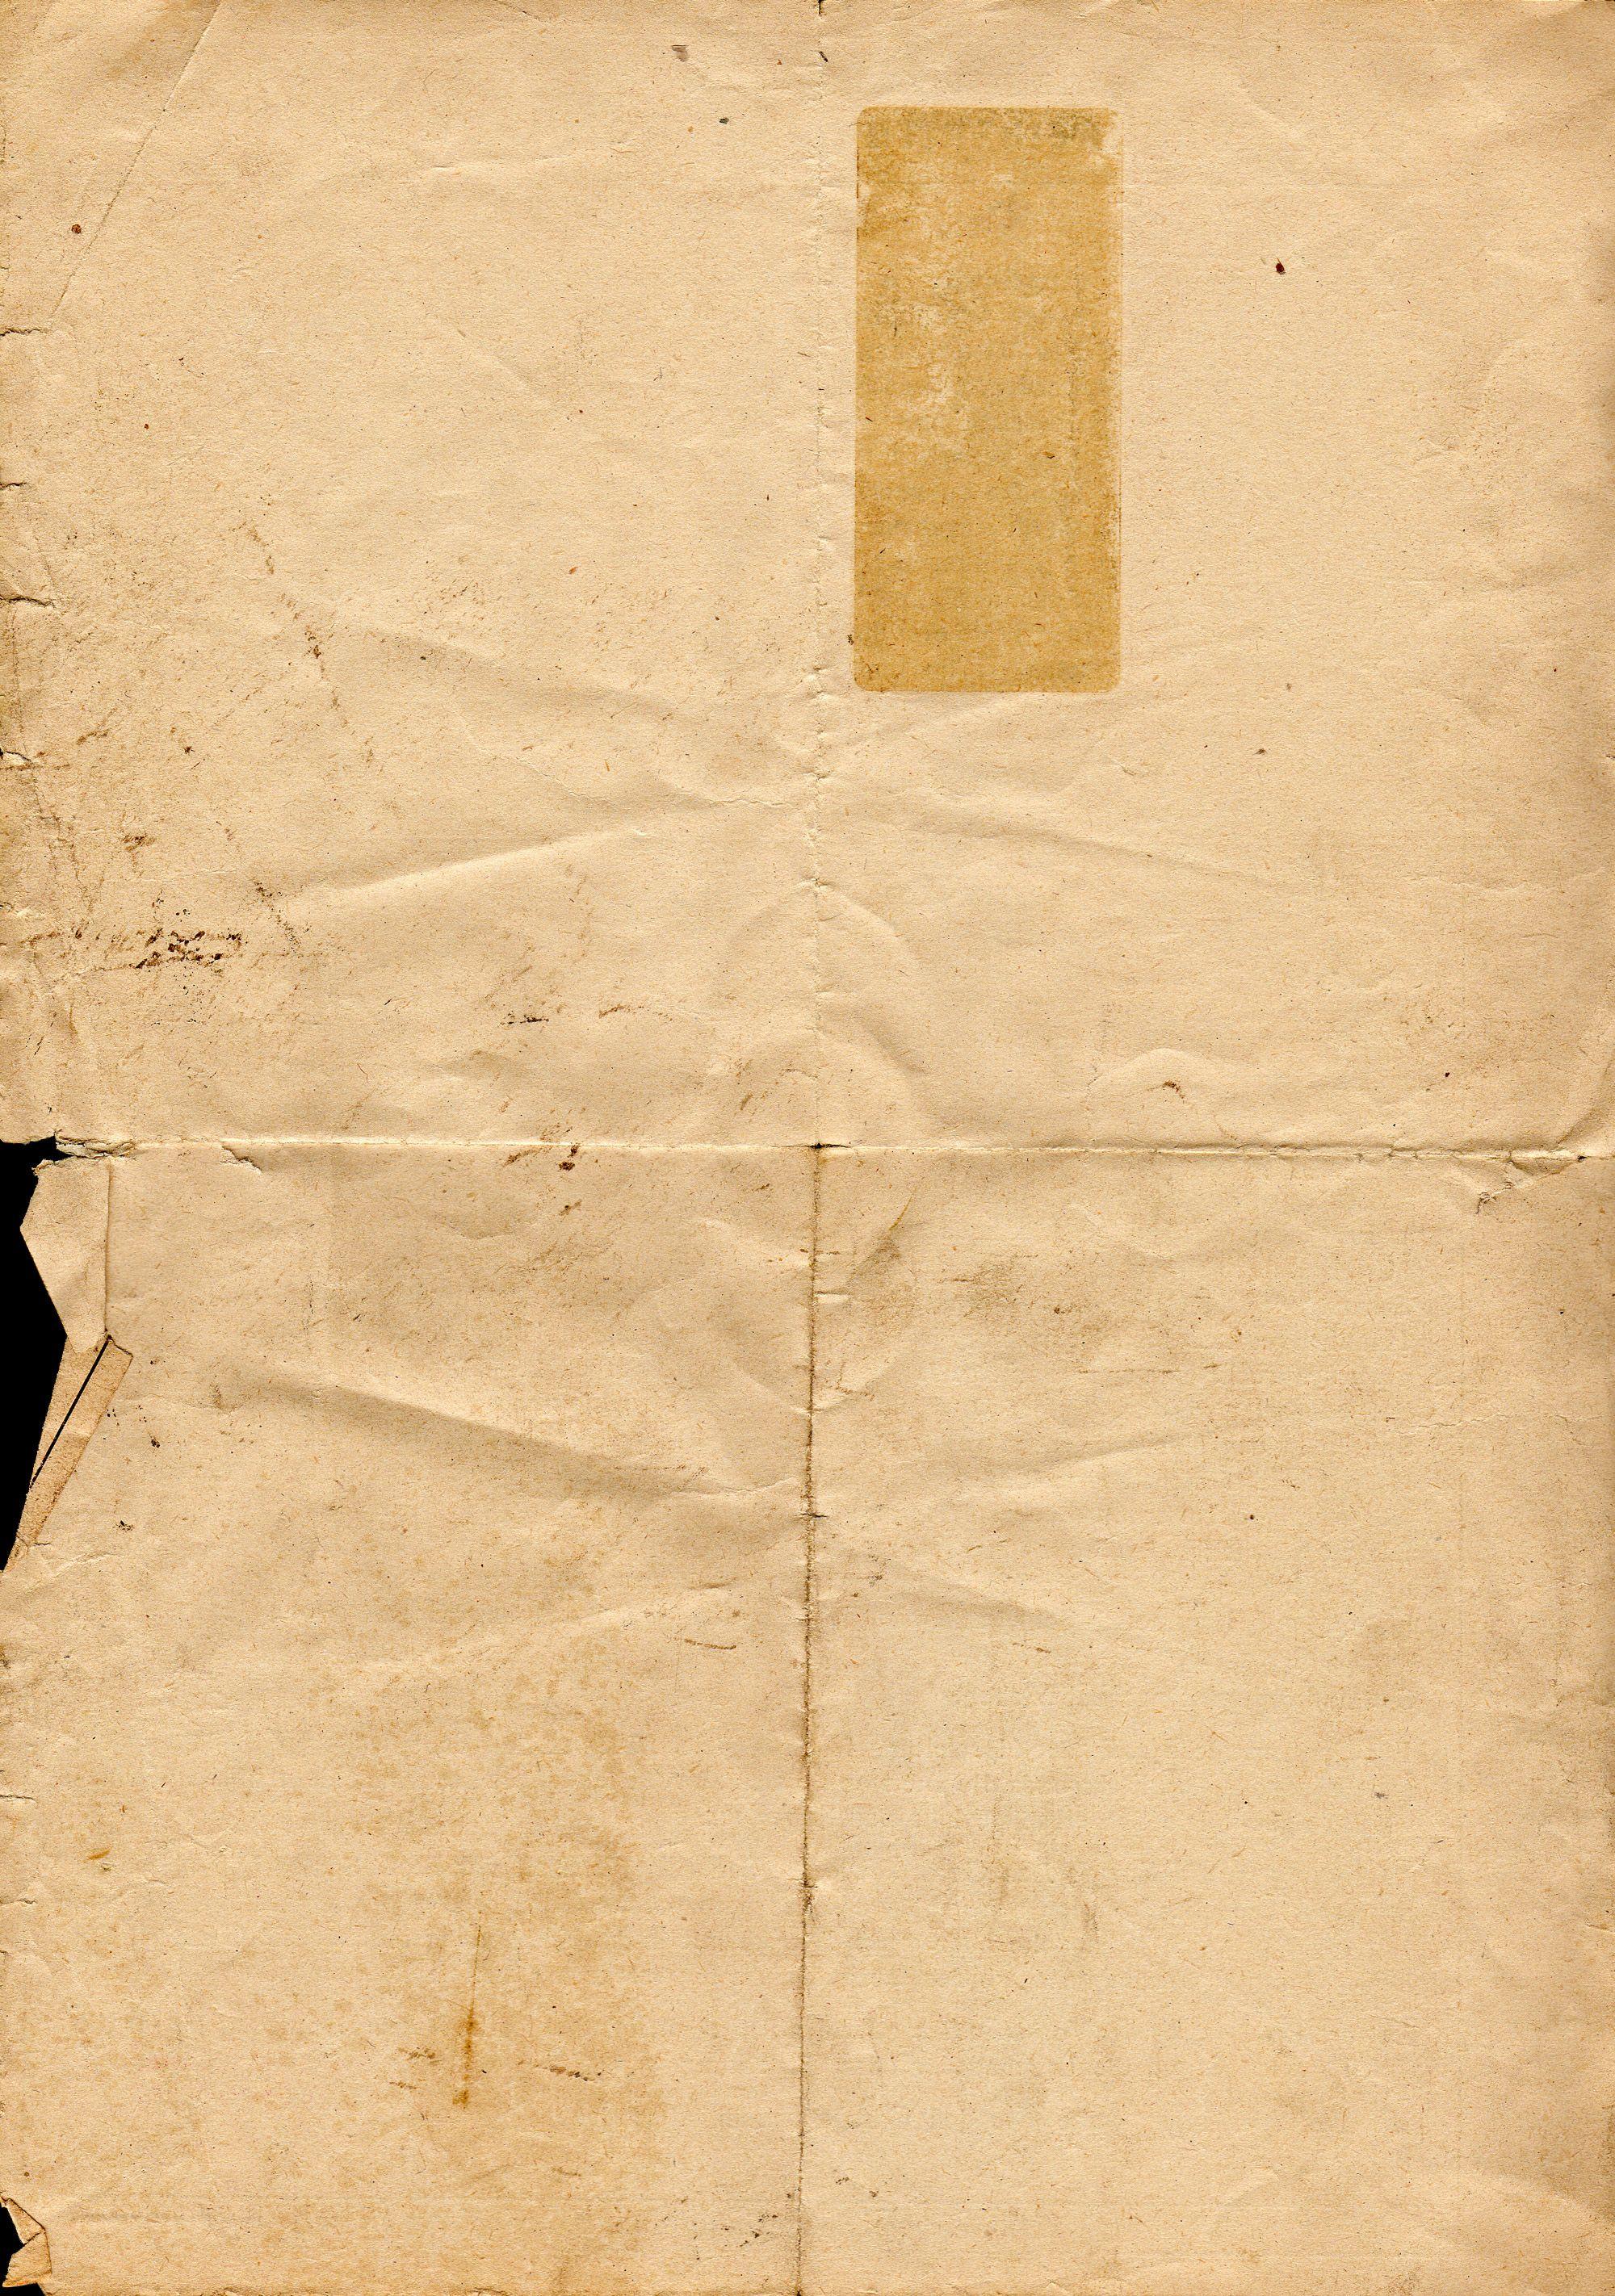 grungy paper texture v8 by bashcorpodeviantartcom